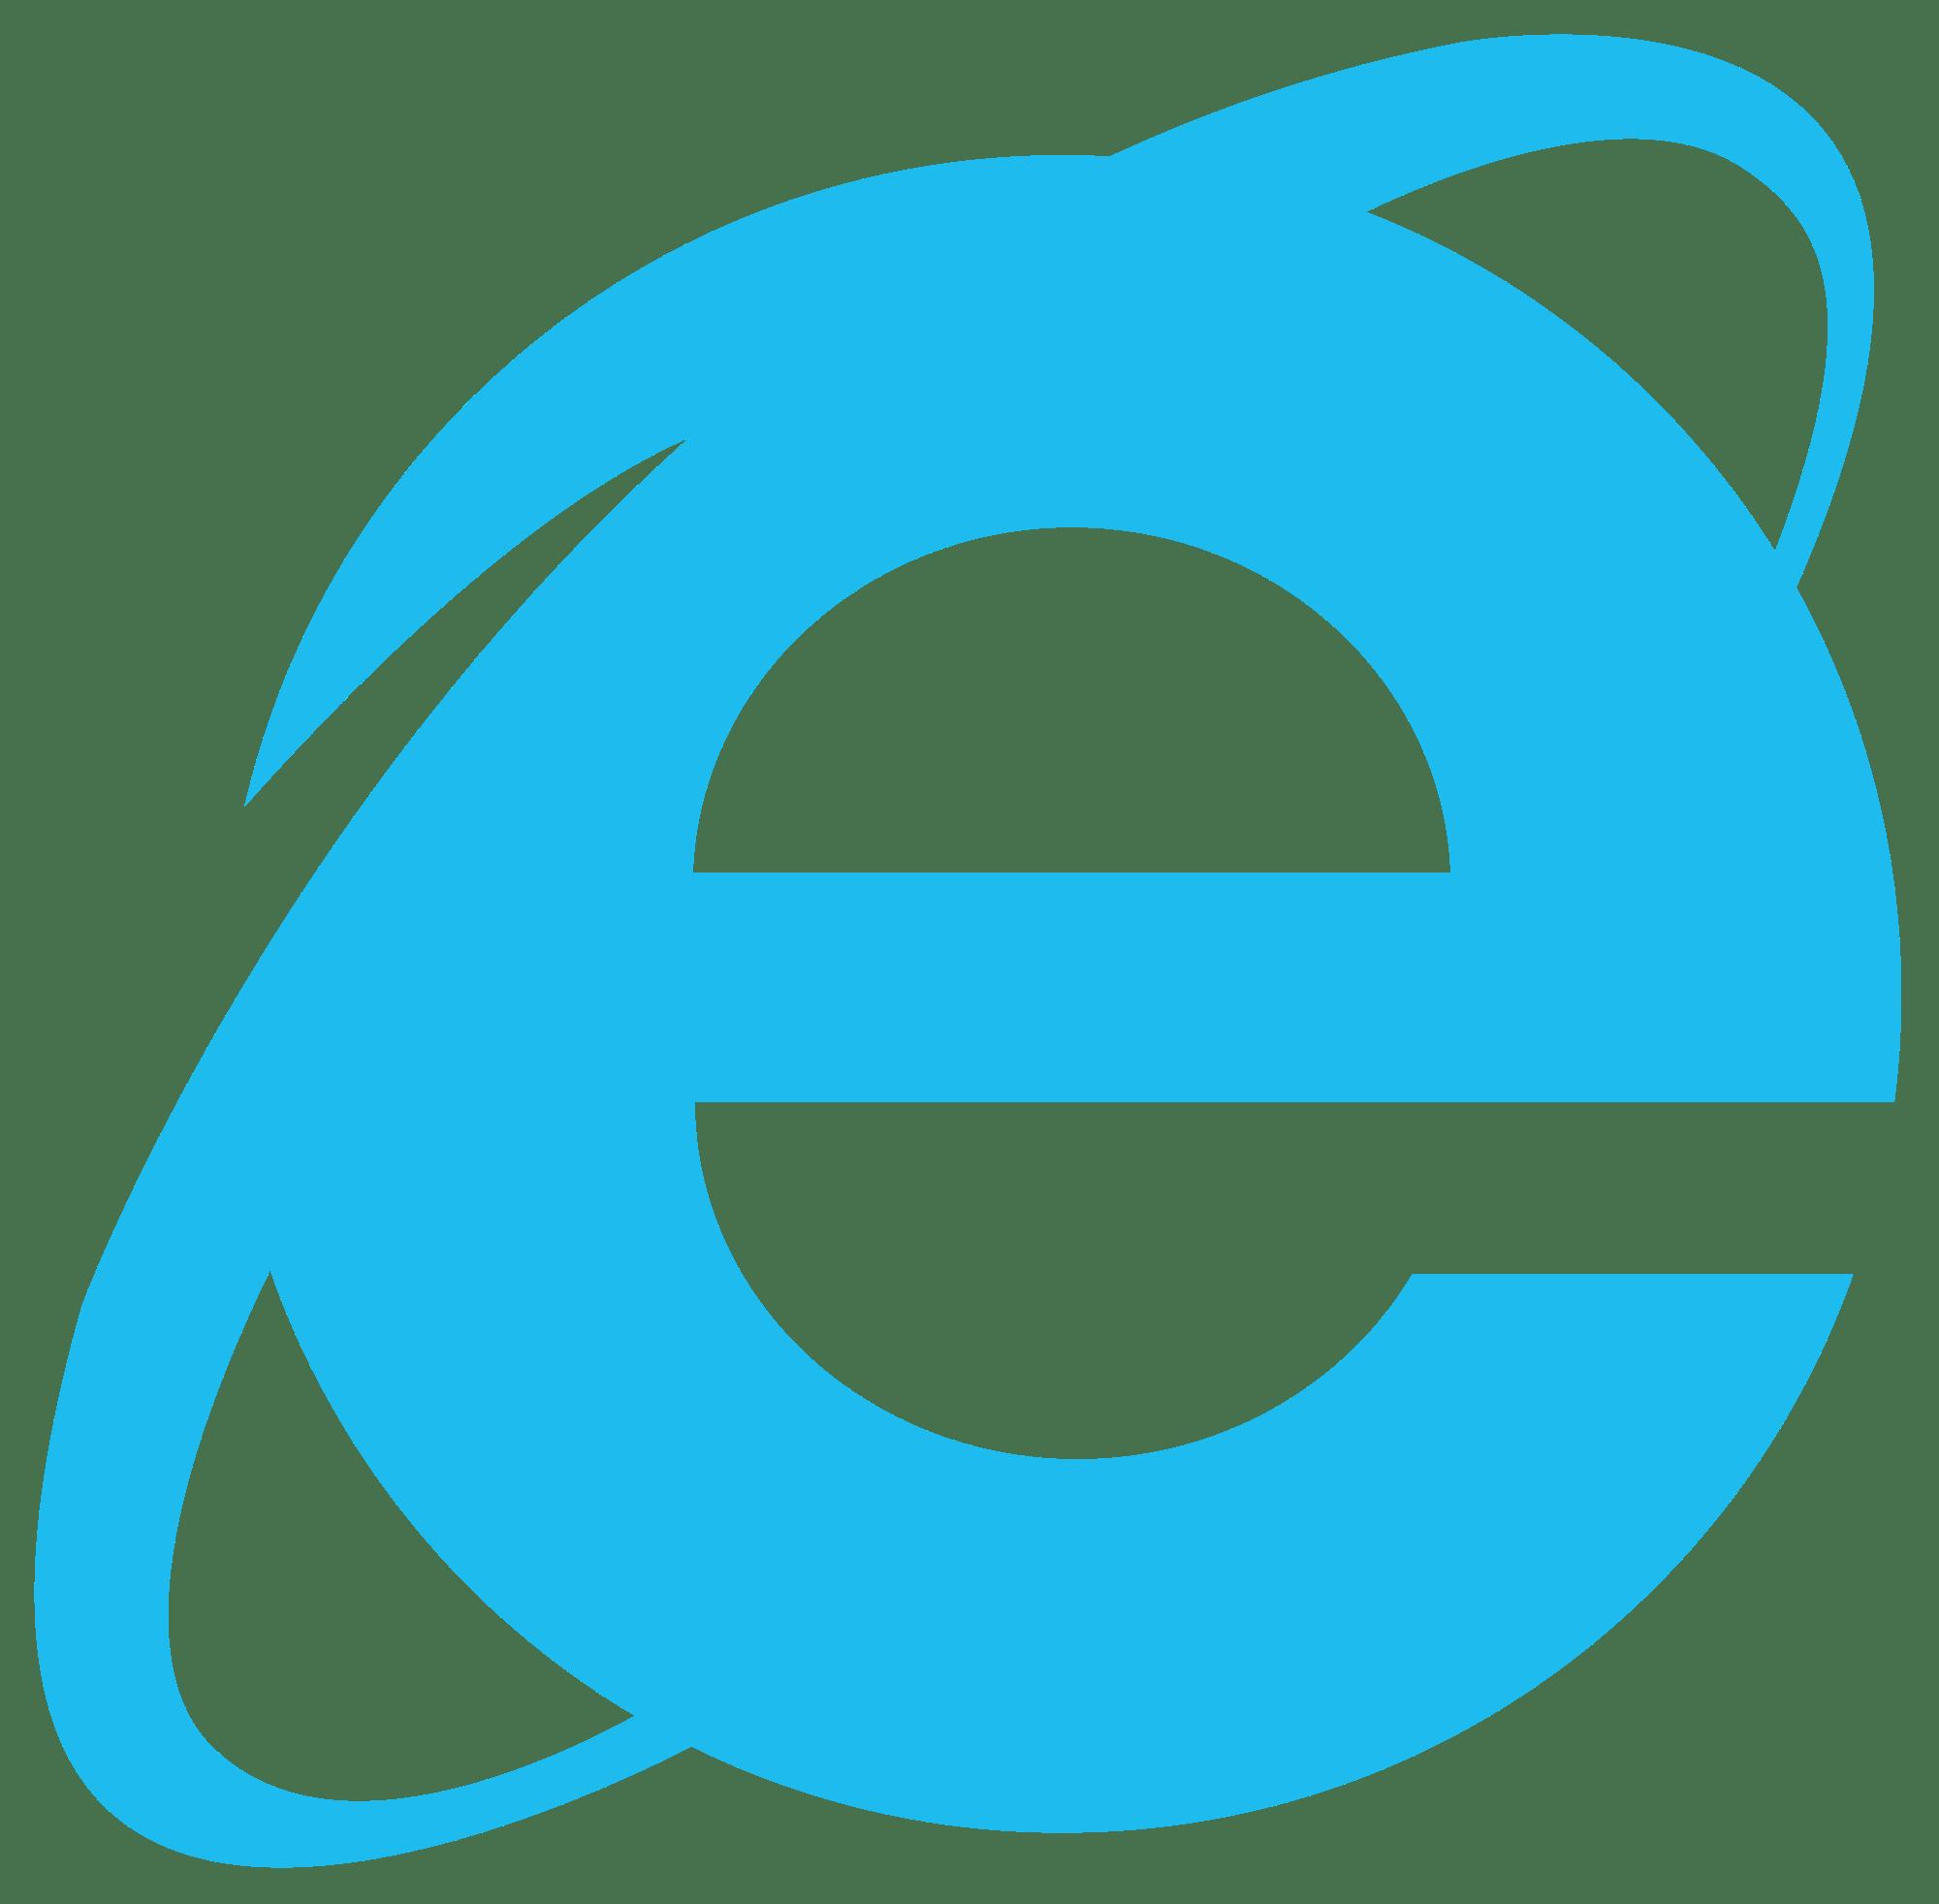 Internet logo transparent png. Explorer clipart background